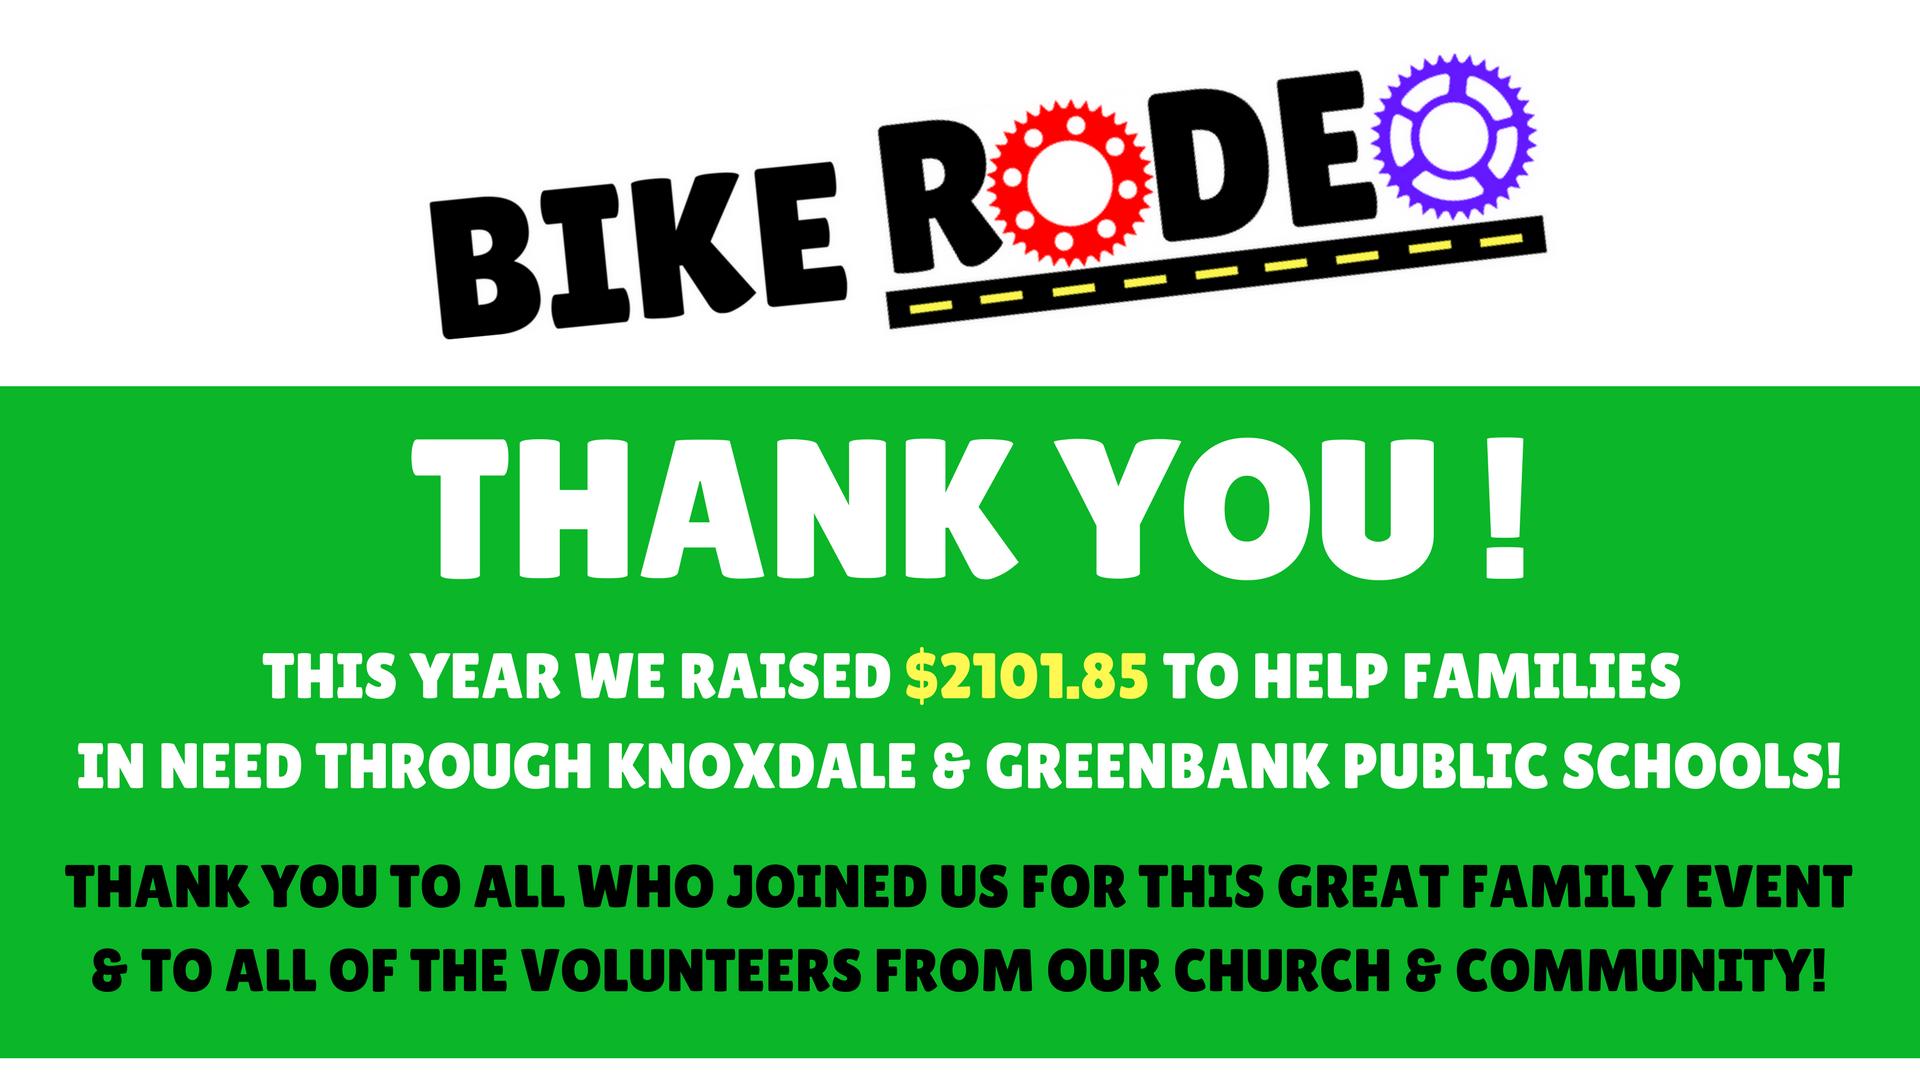 bike rodeo 2017 arlington woods church